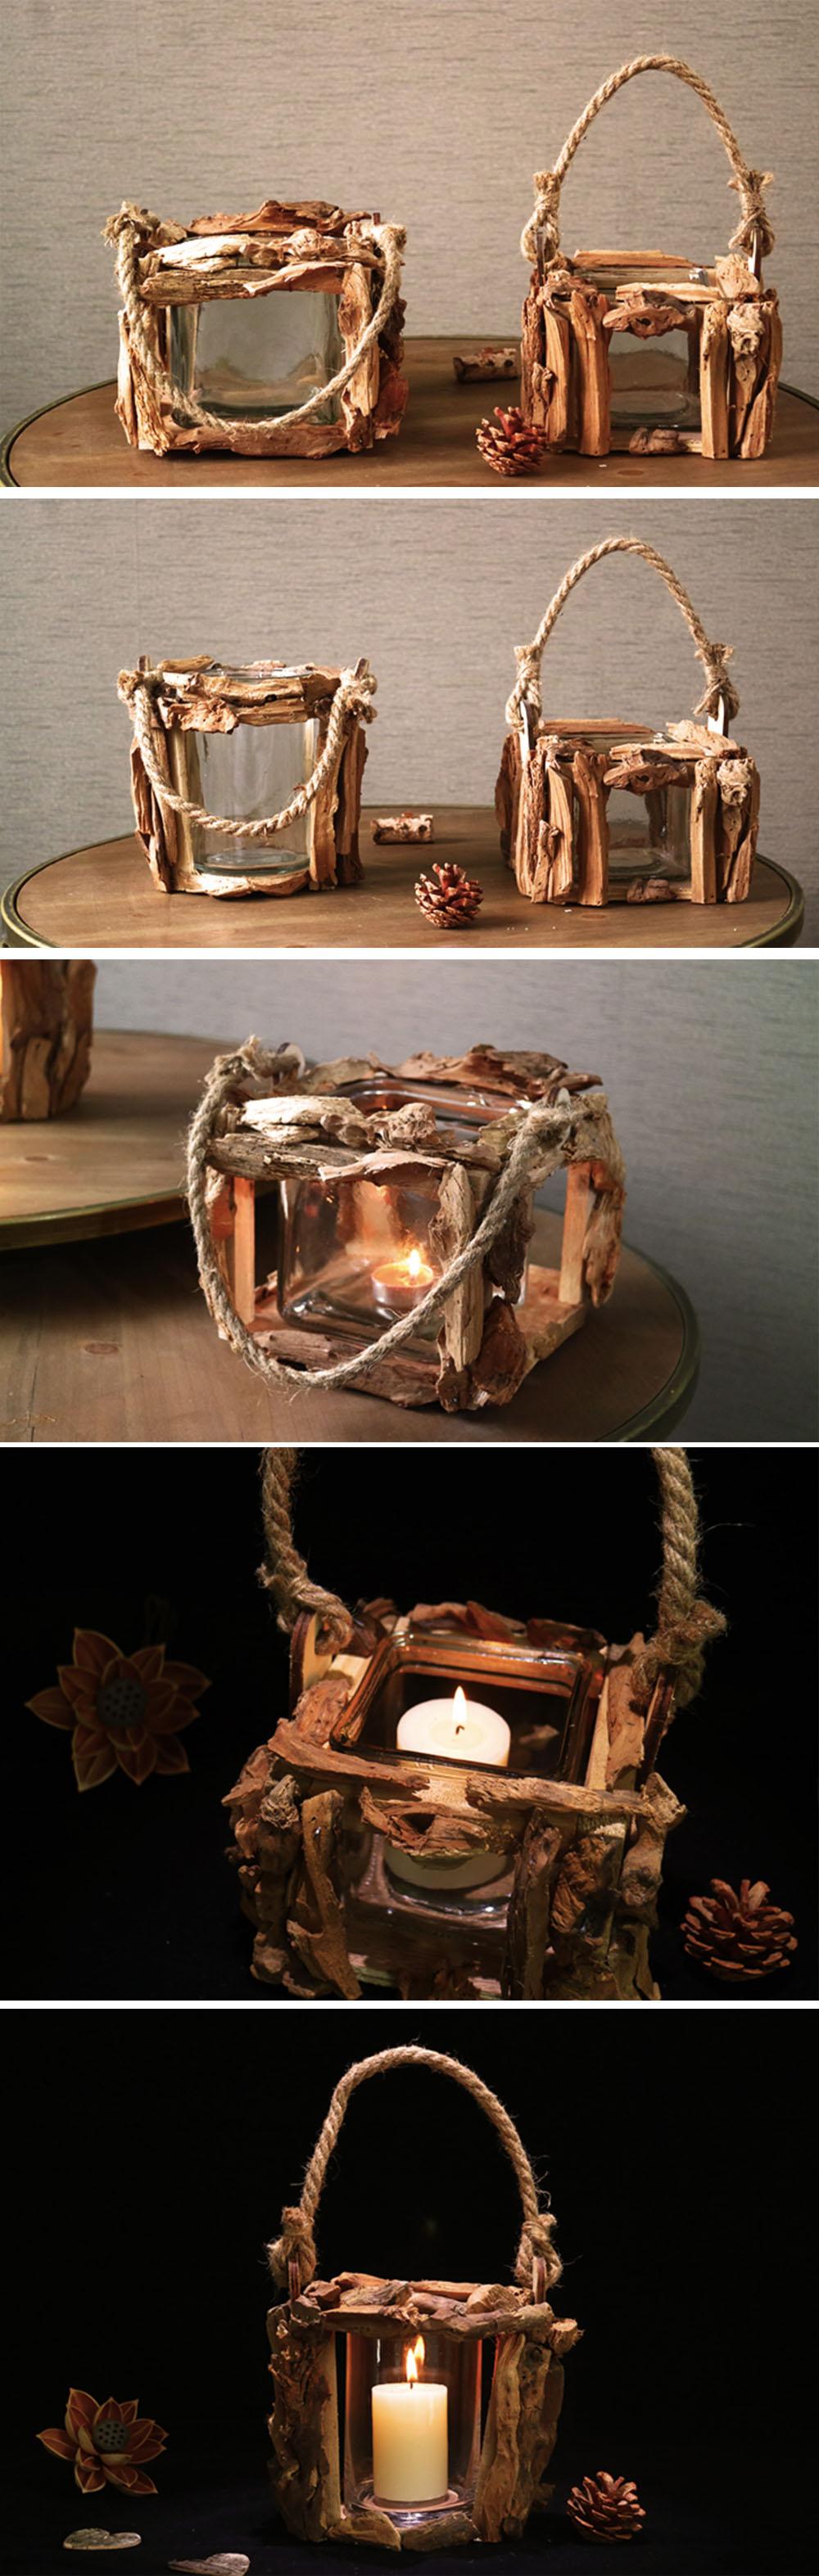 Handmade Candle Holder Vintage Style